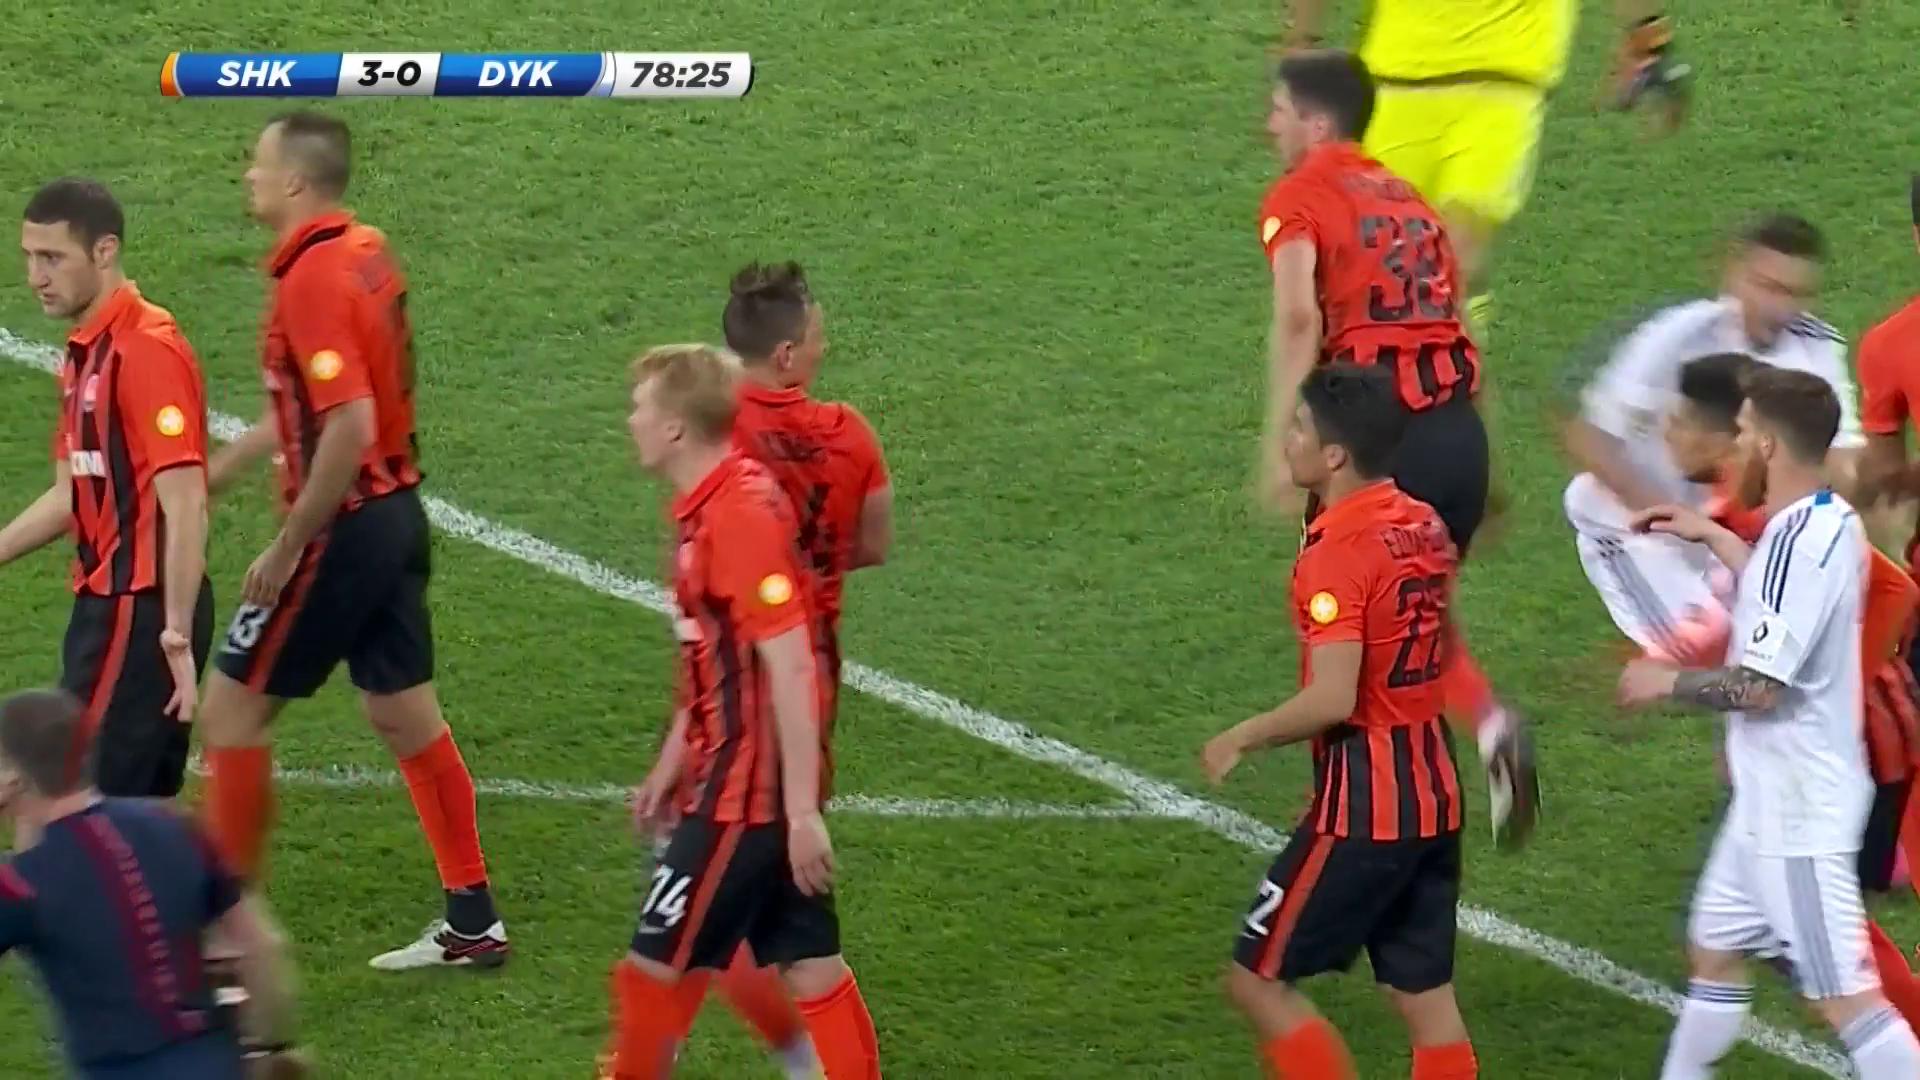 Shakhtar Donetsk 3-0 Dynamo Kyiv Match Highlights